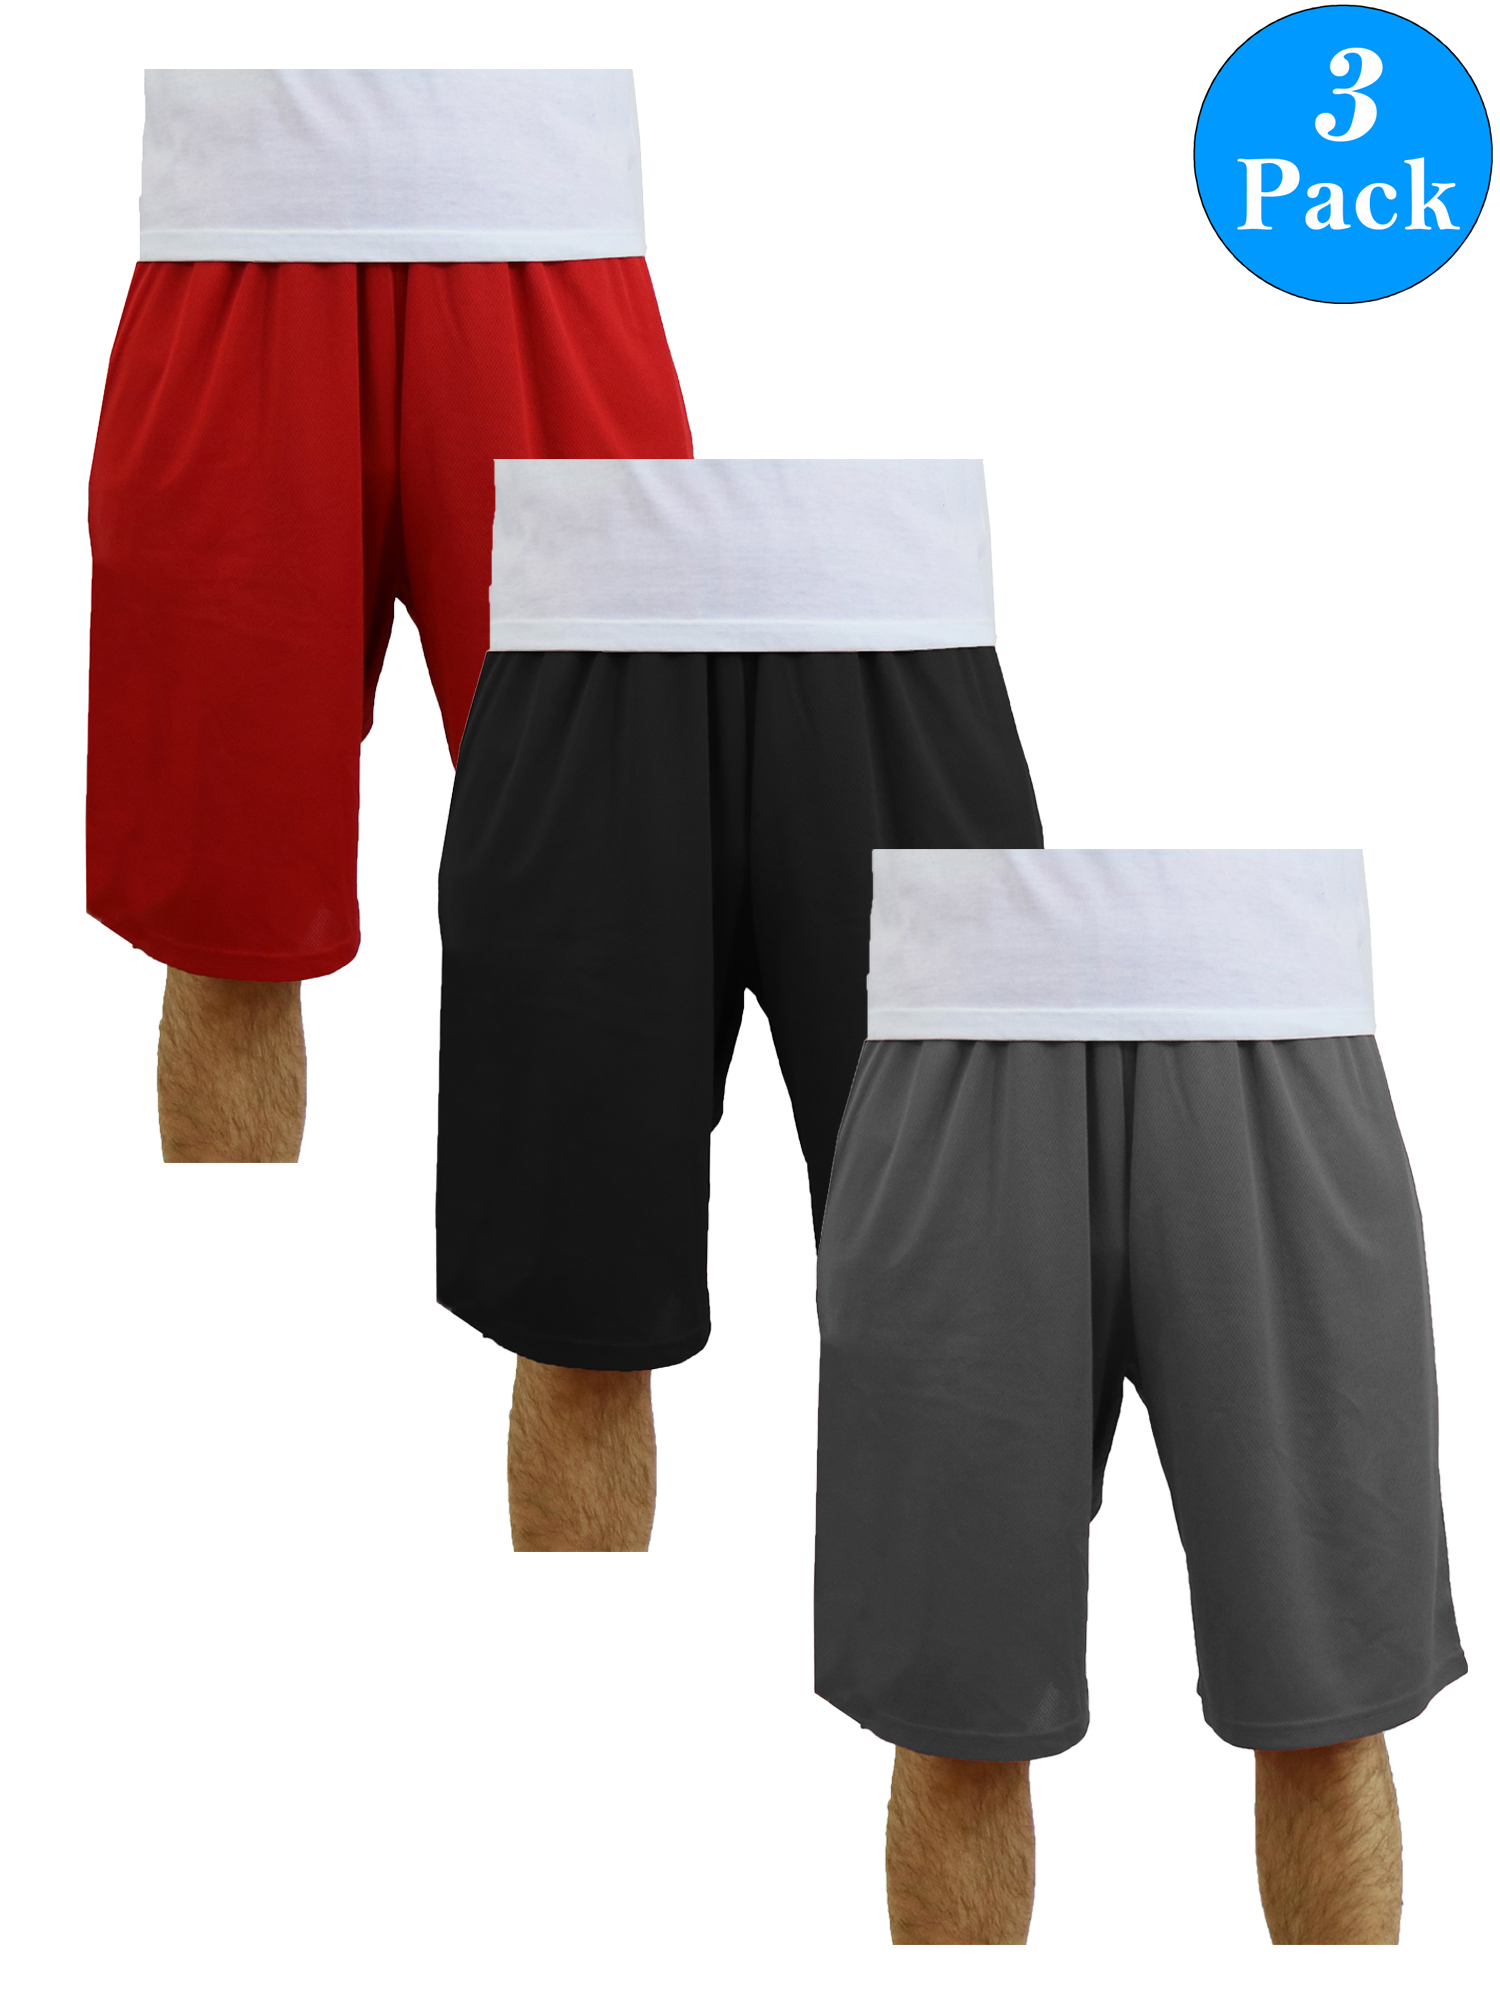 Men's Moisture Wicking Active Mesh Shorts (3-Pack)